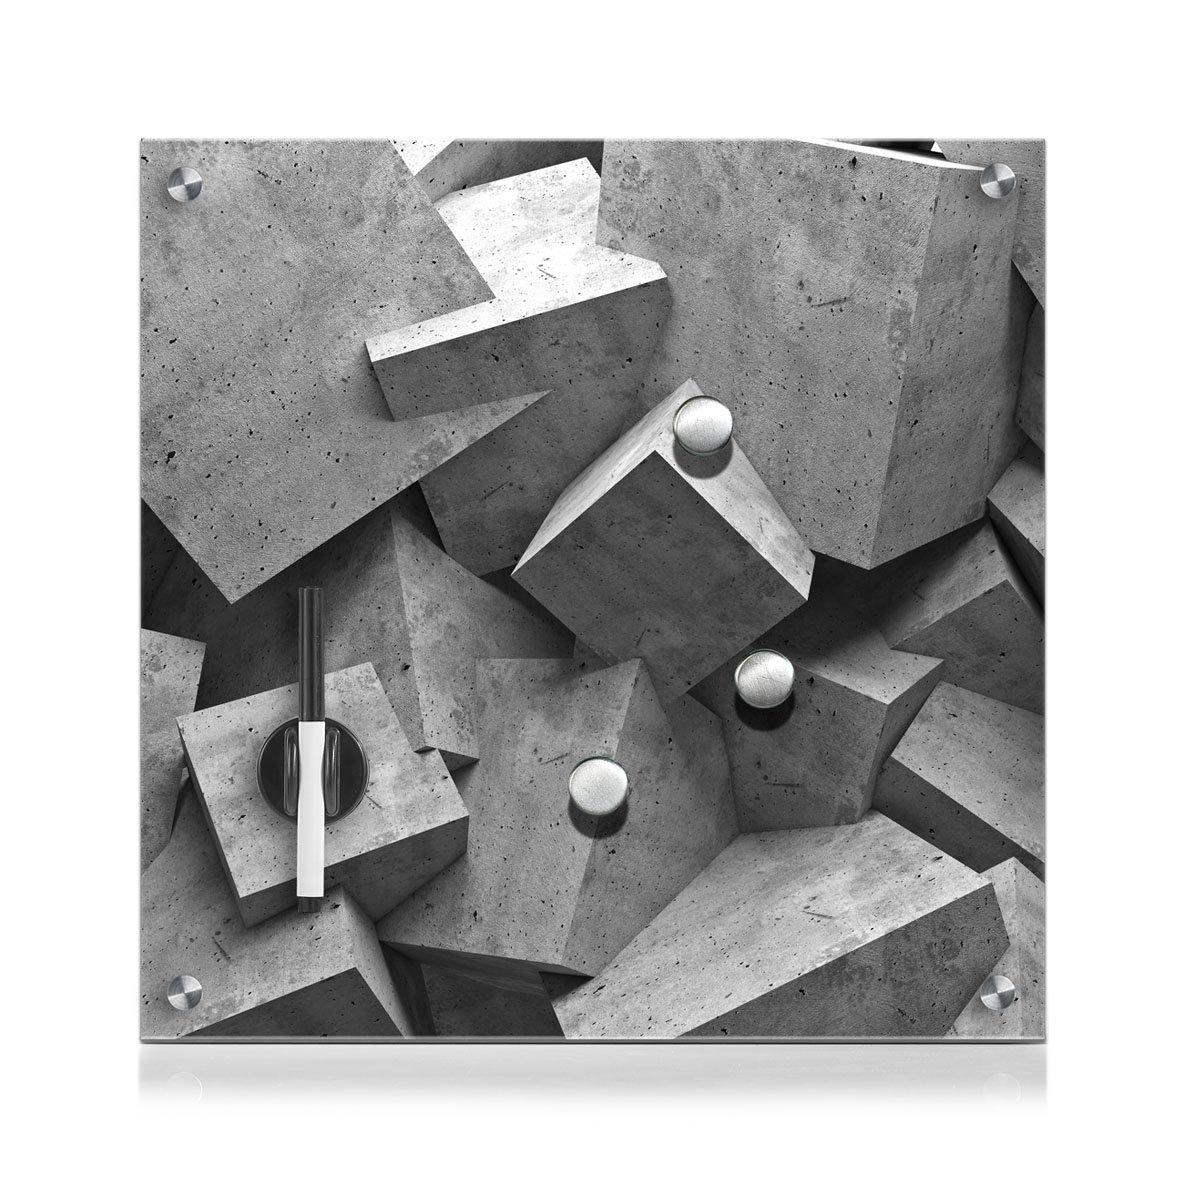 Zeller Present 11654Memo Board Inch Cubes, Glass, Grey, 40x 40 cm by Zeller